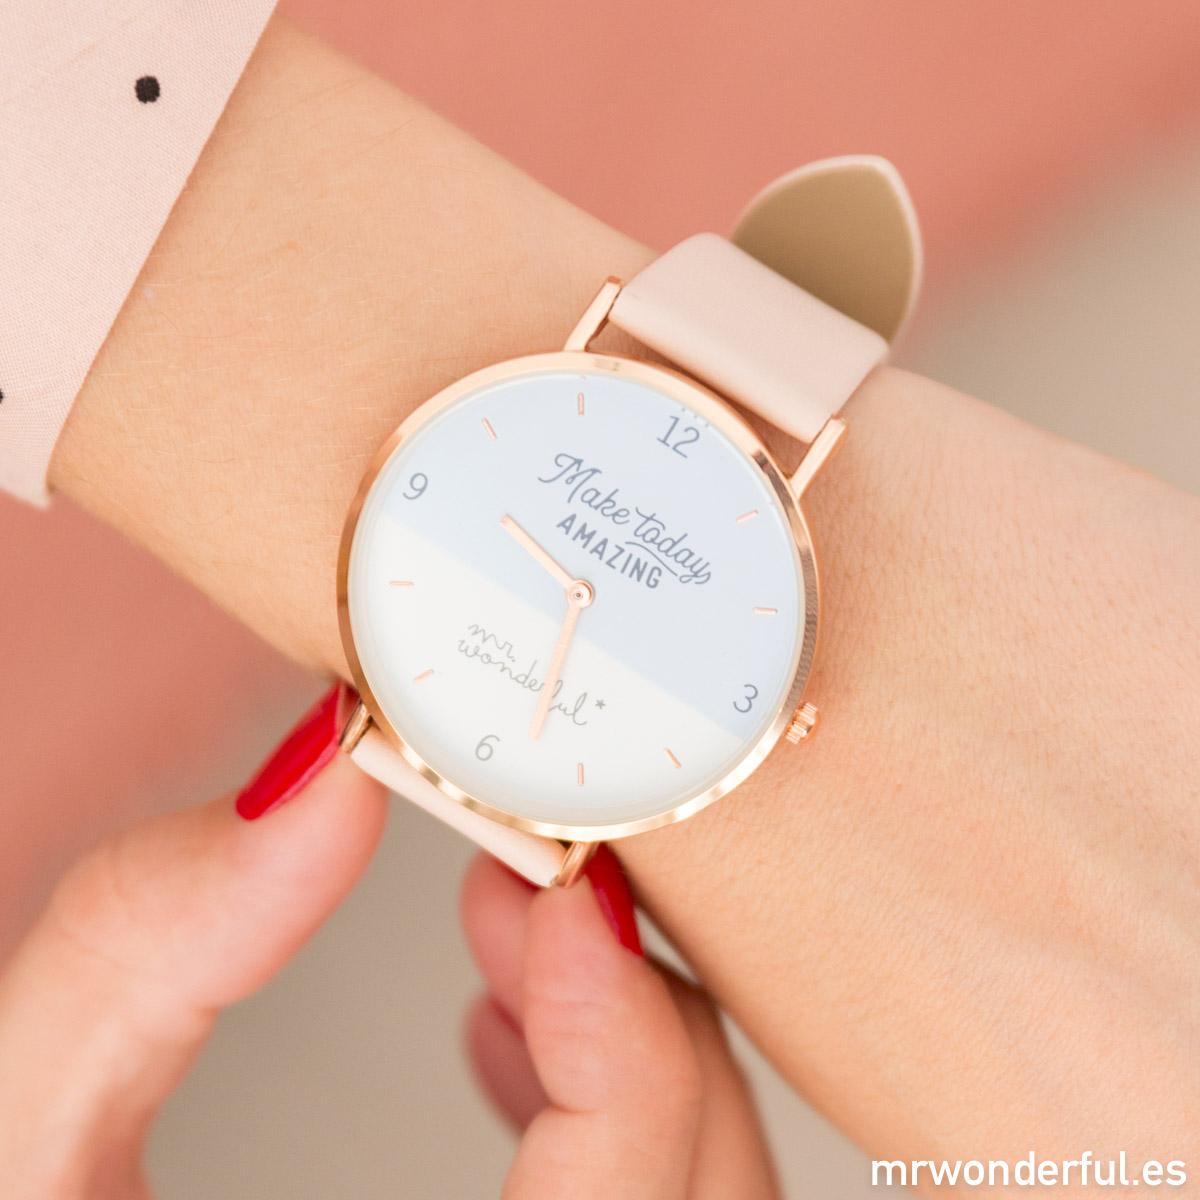 Relojes especiales Mr Wonderful